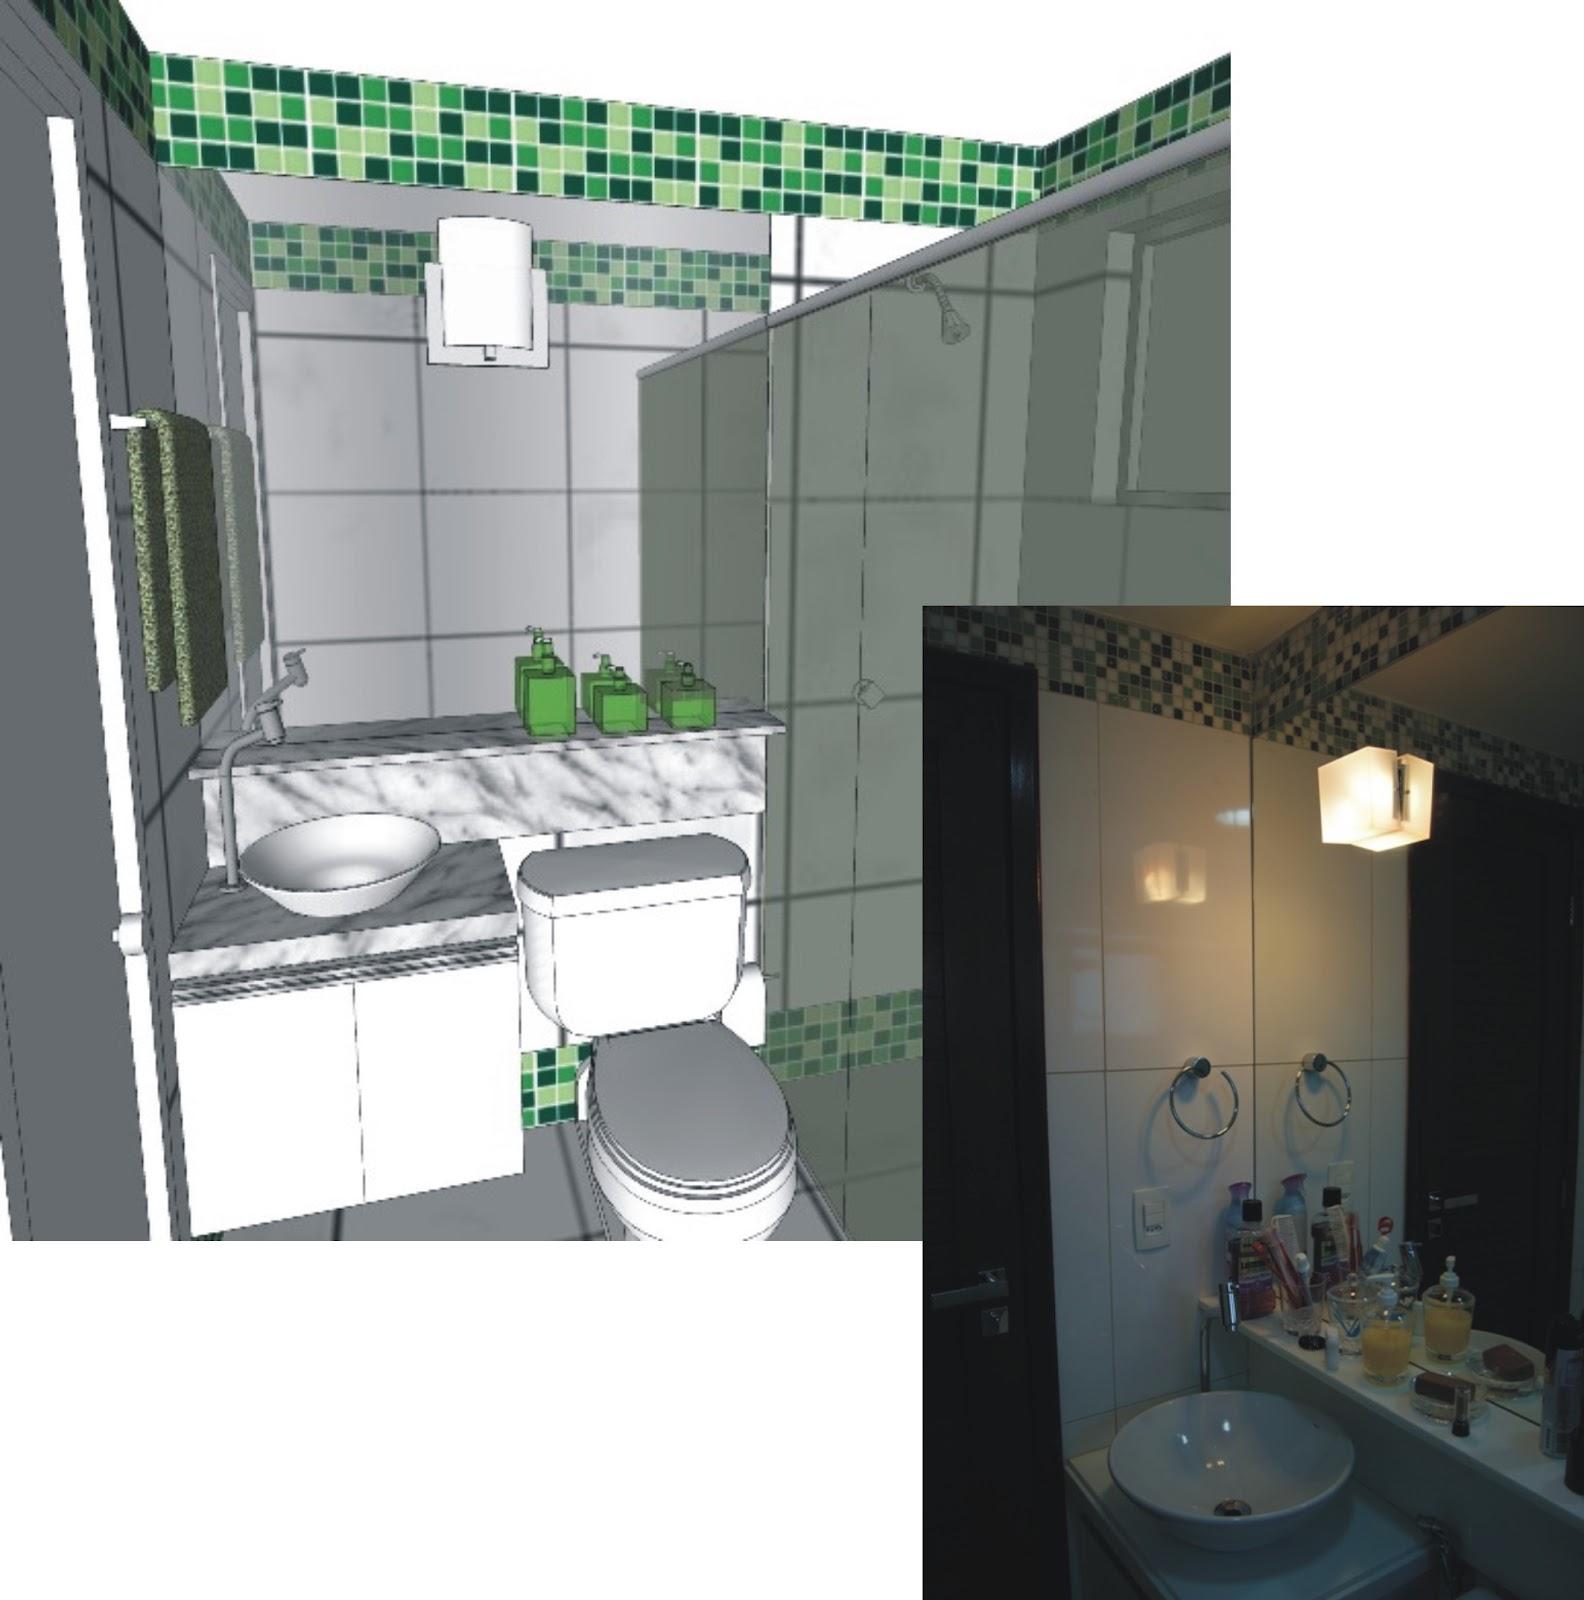 #3D6B4A ANDREA MELO: REFORMA APARTAMENTO COMPACTO (2010) 1584x1600 px projeto banheiro compacto